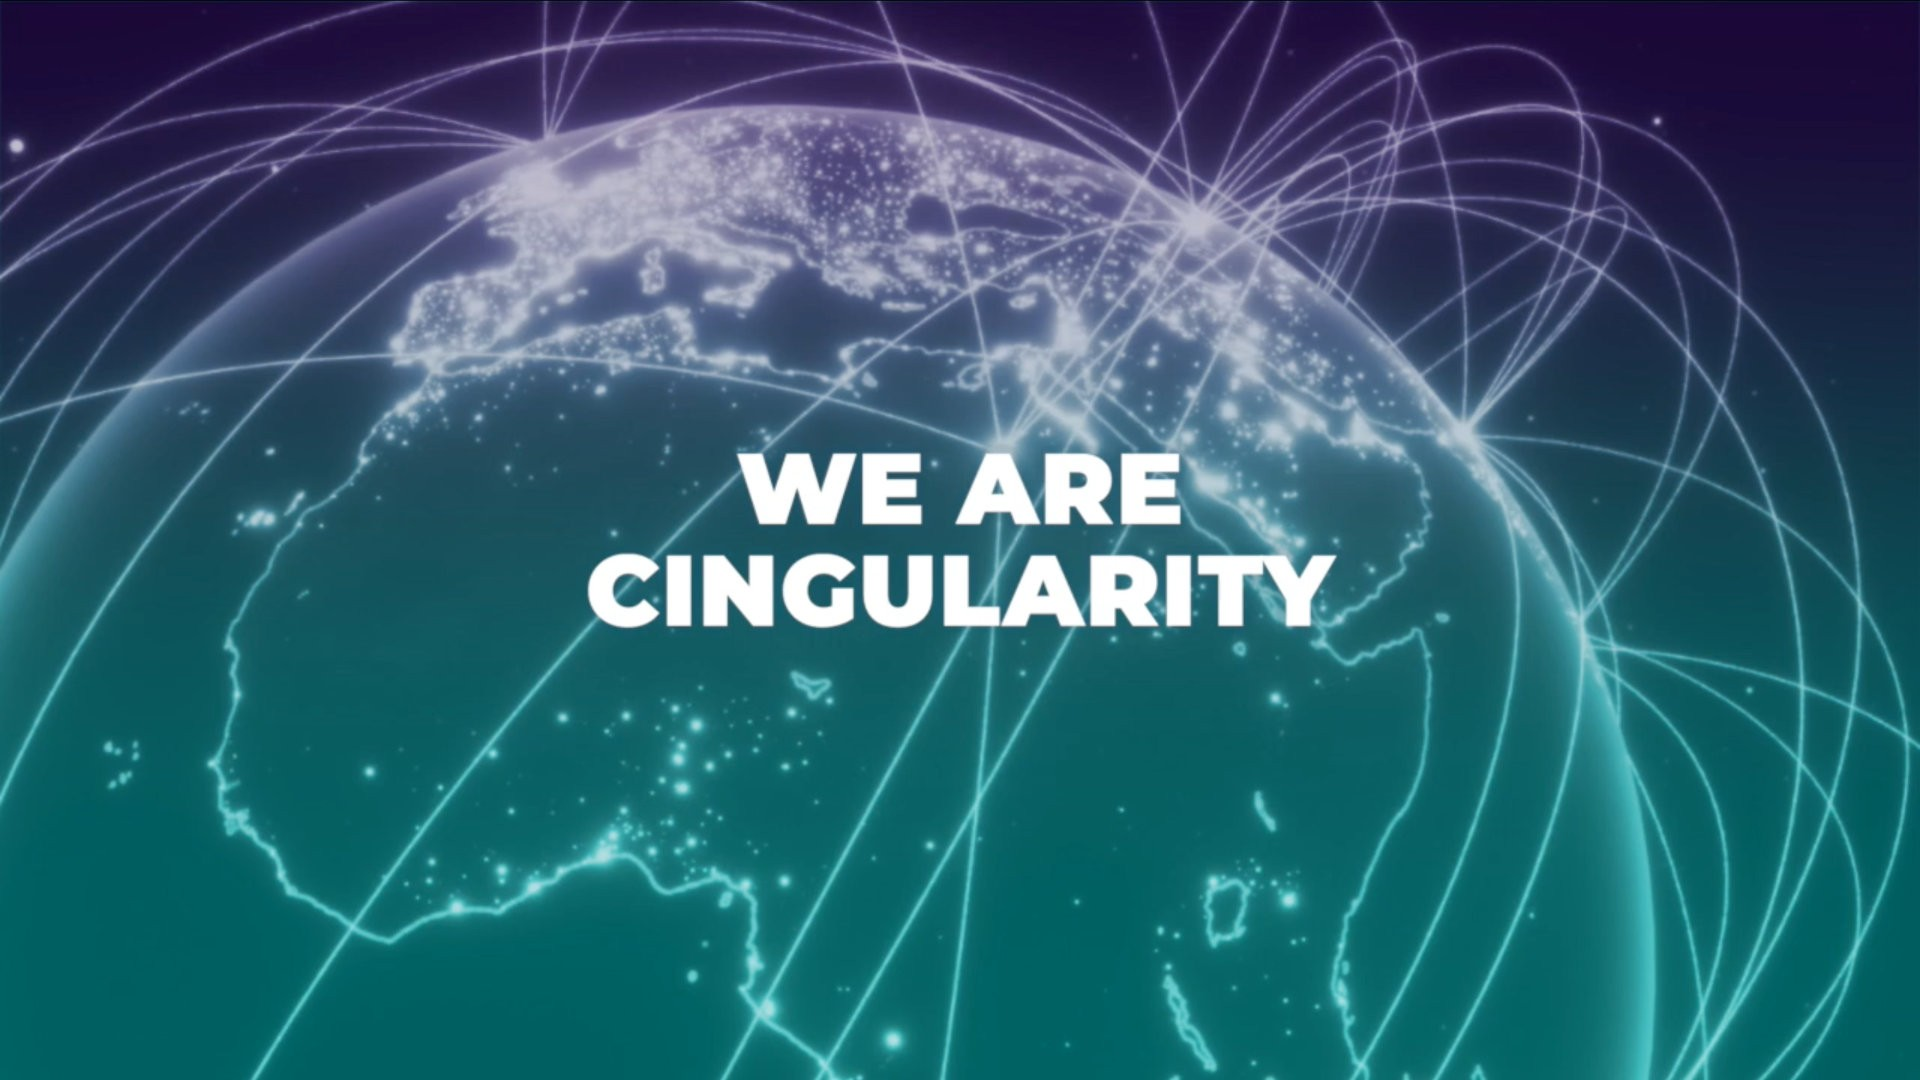 We are Cingularity